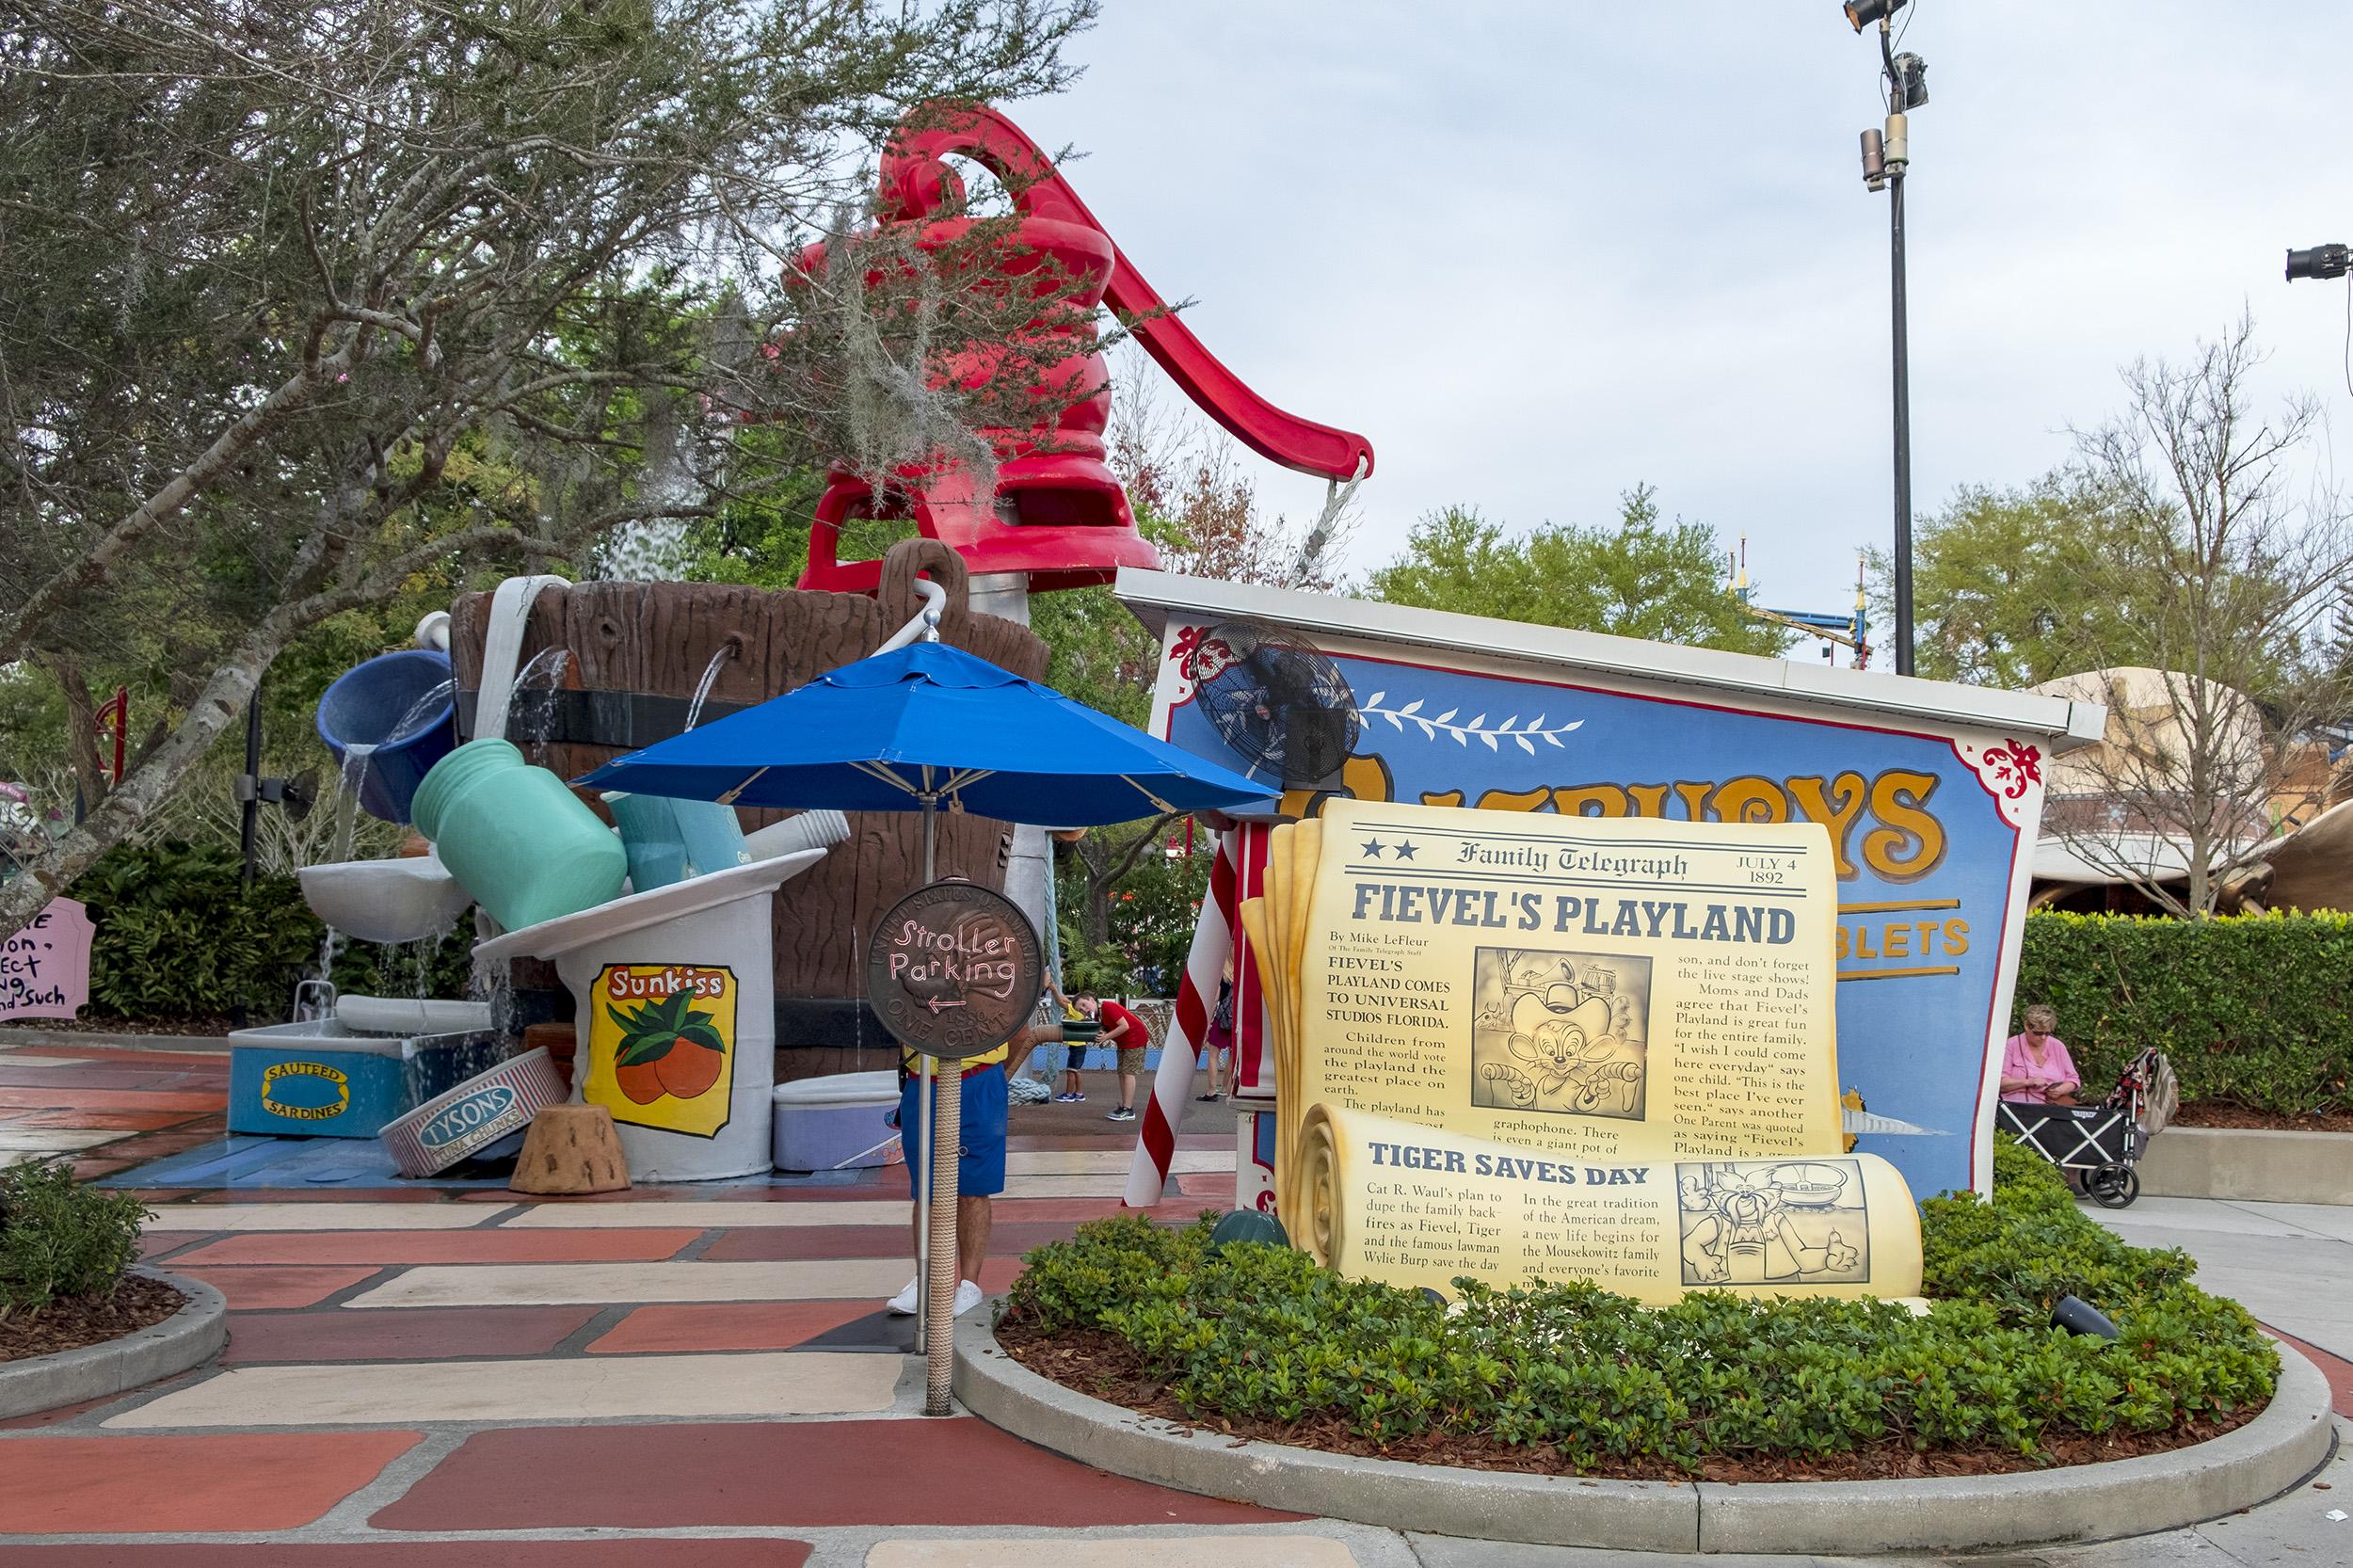 Fievel's Playland